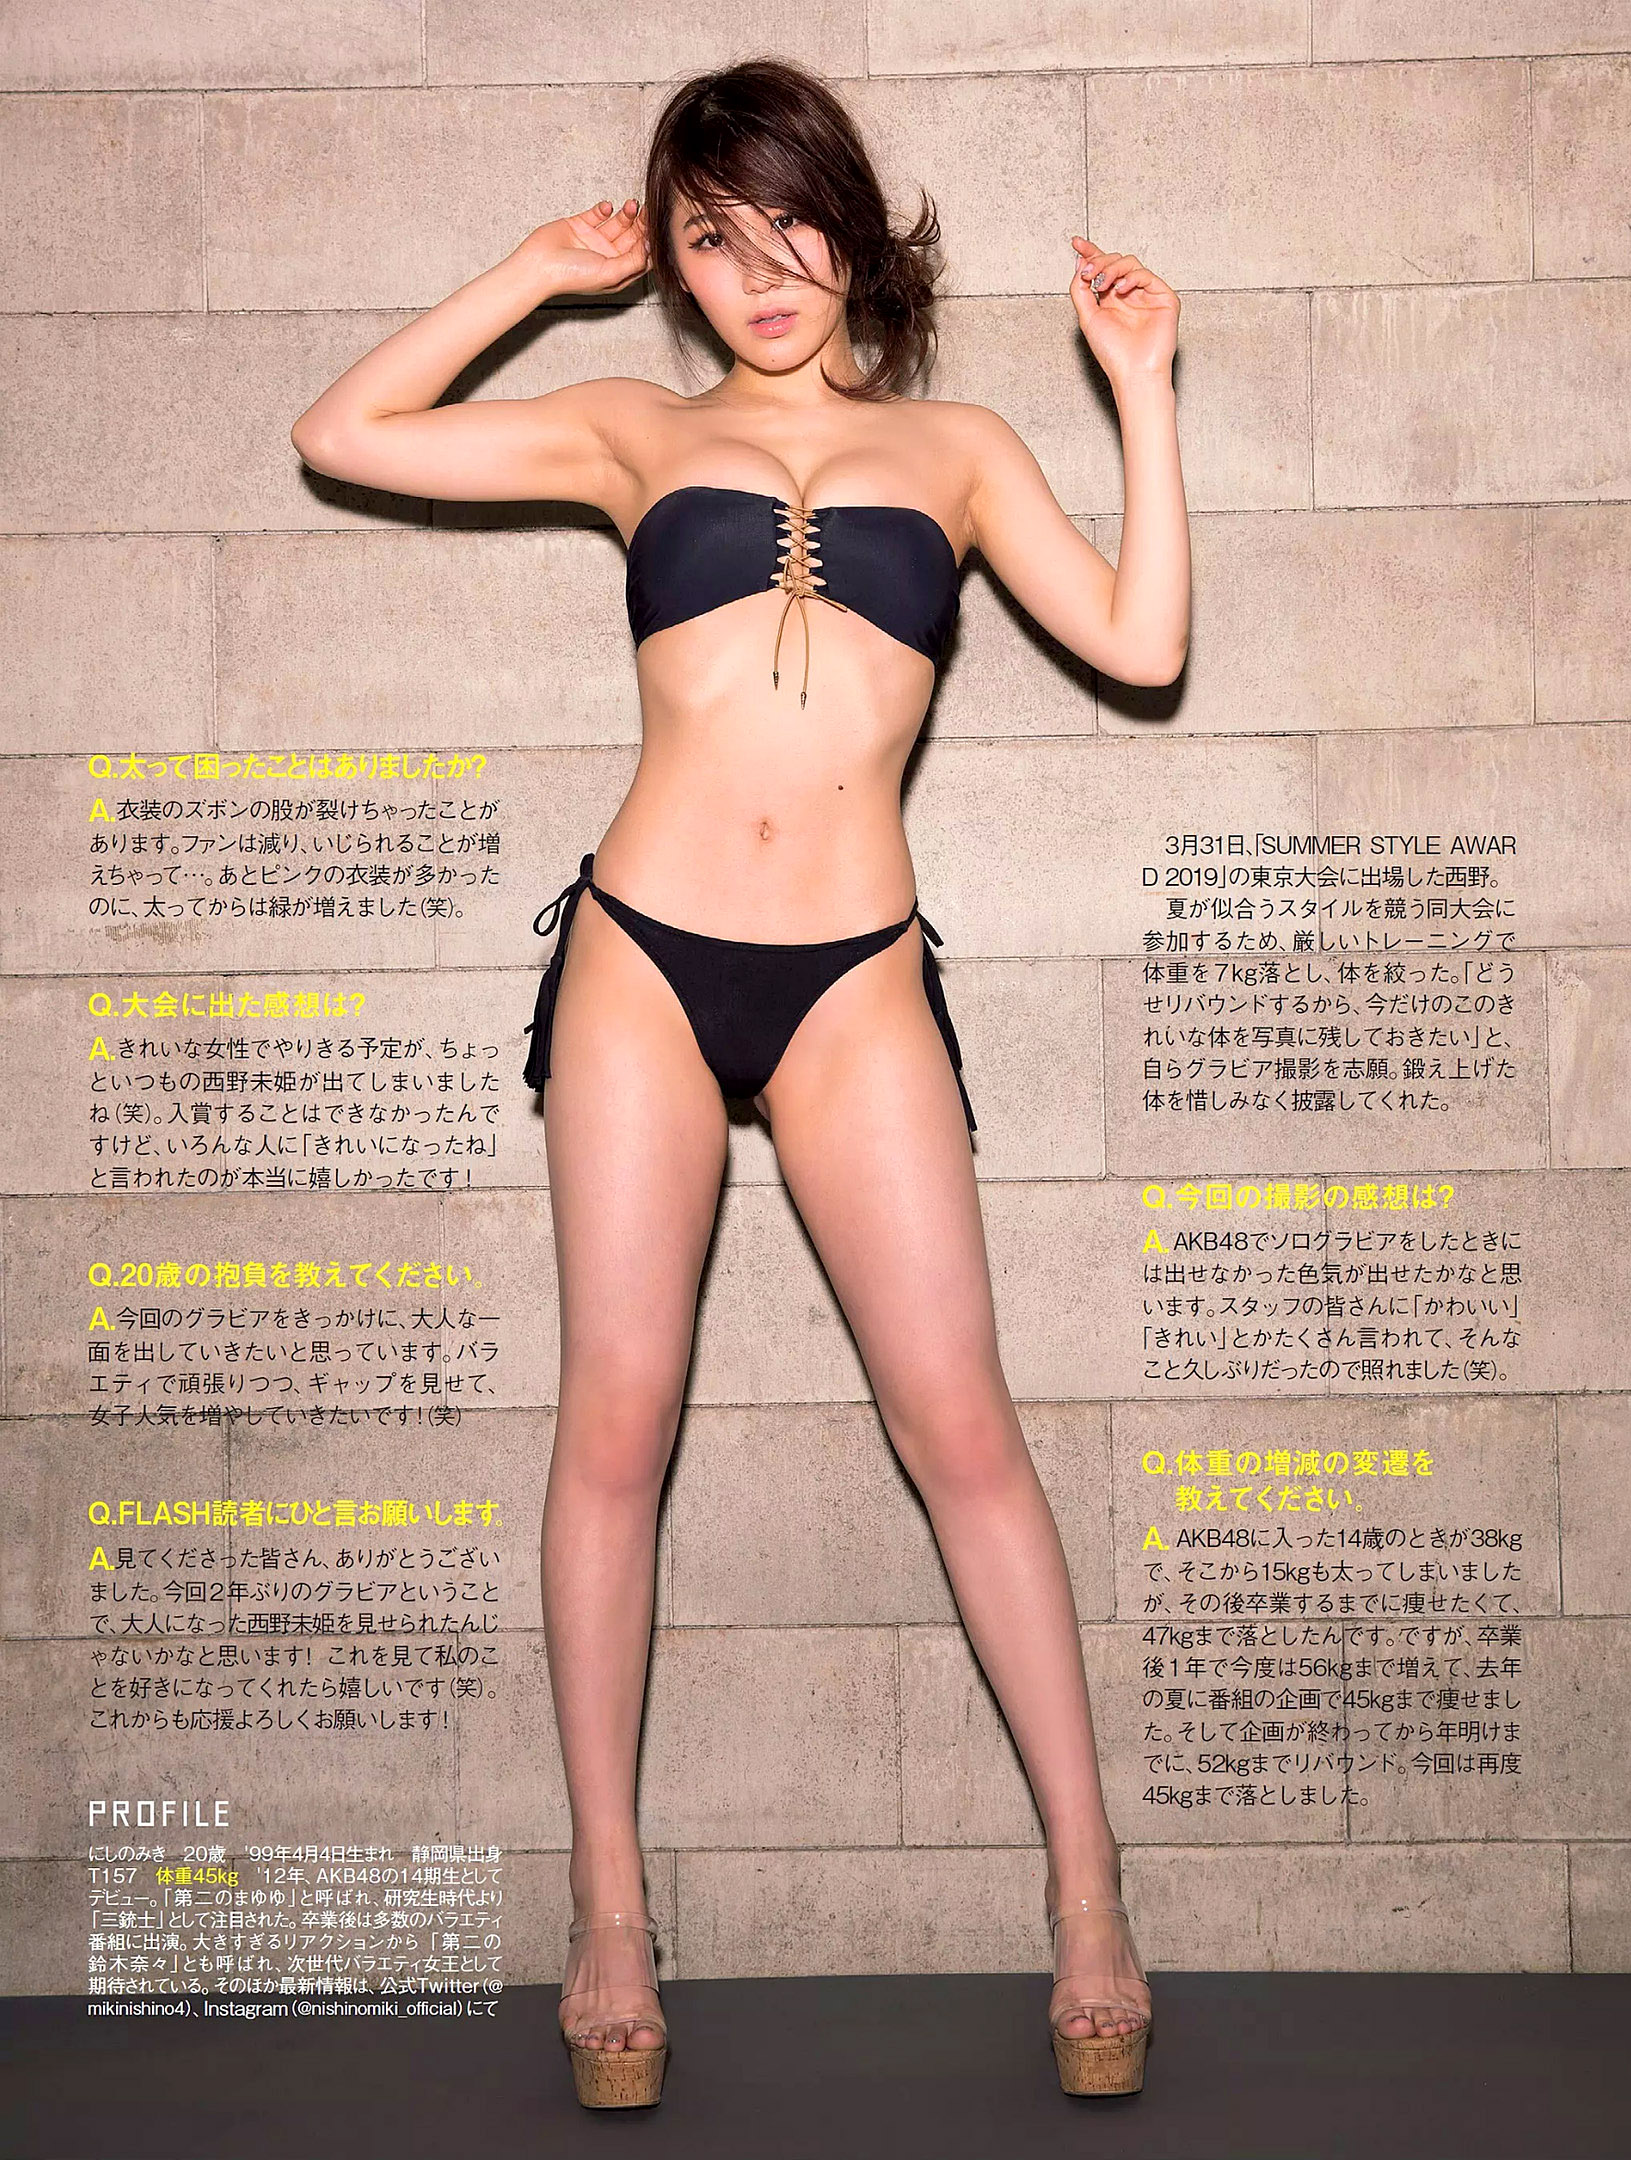 Miki Nishino Flash 190423 03.jpg